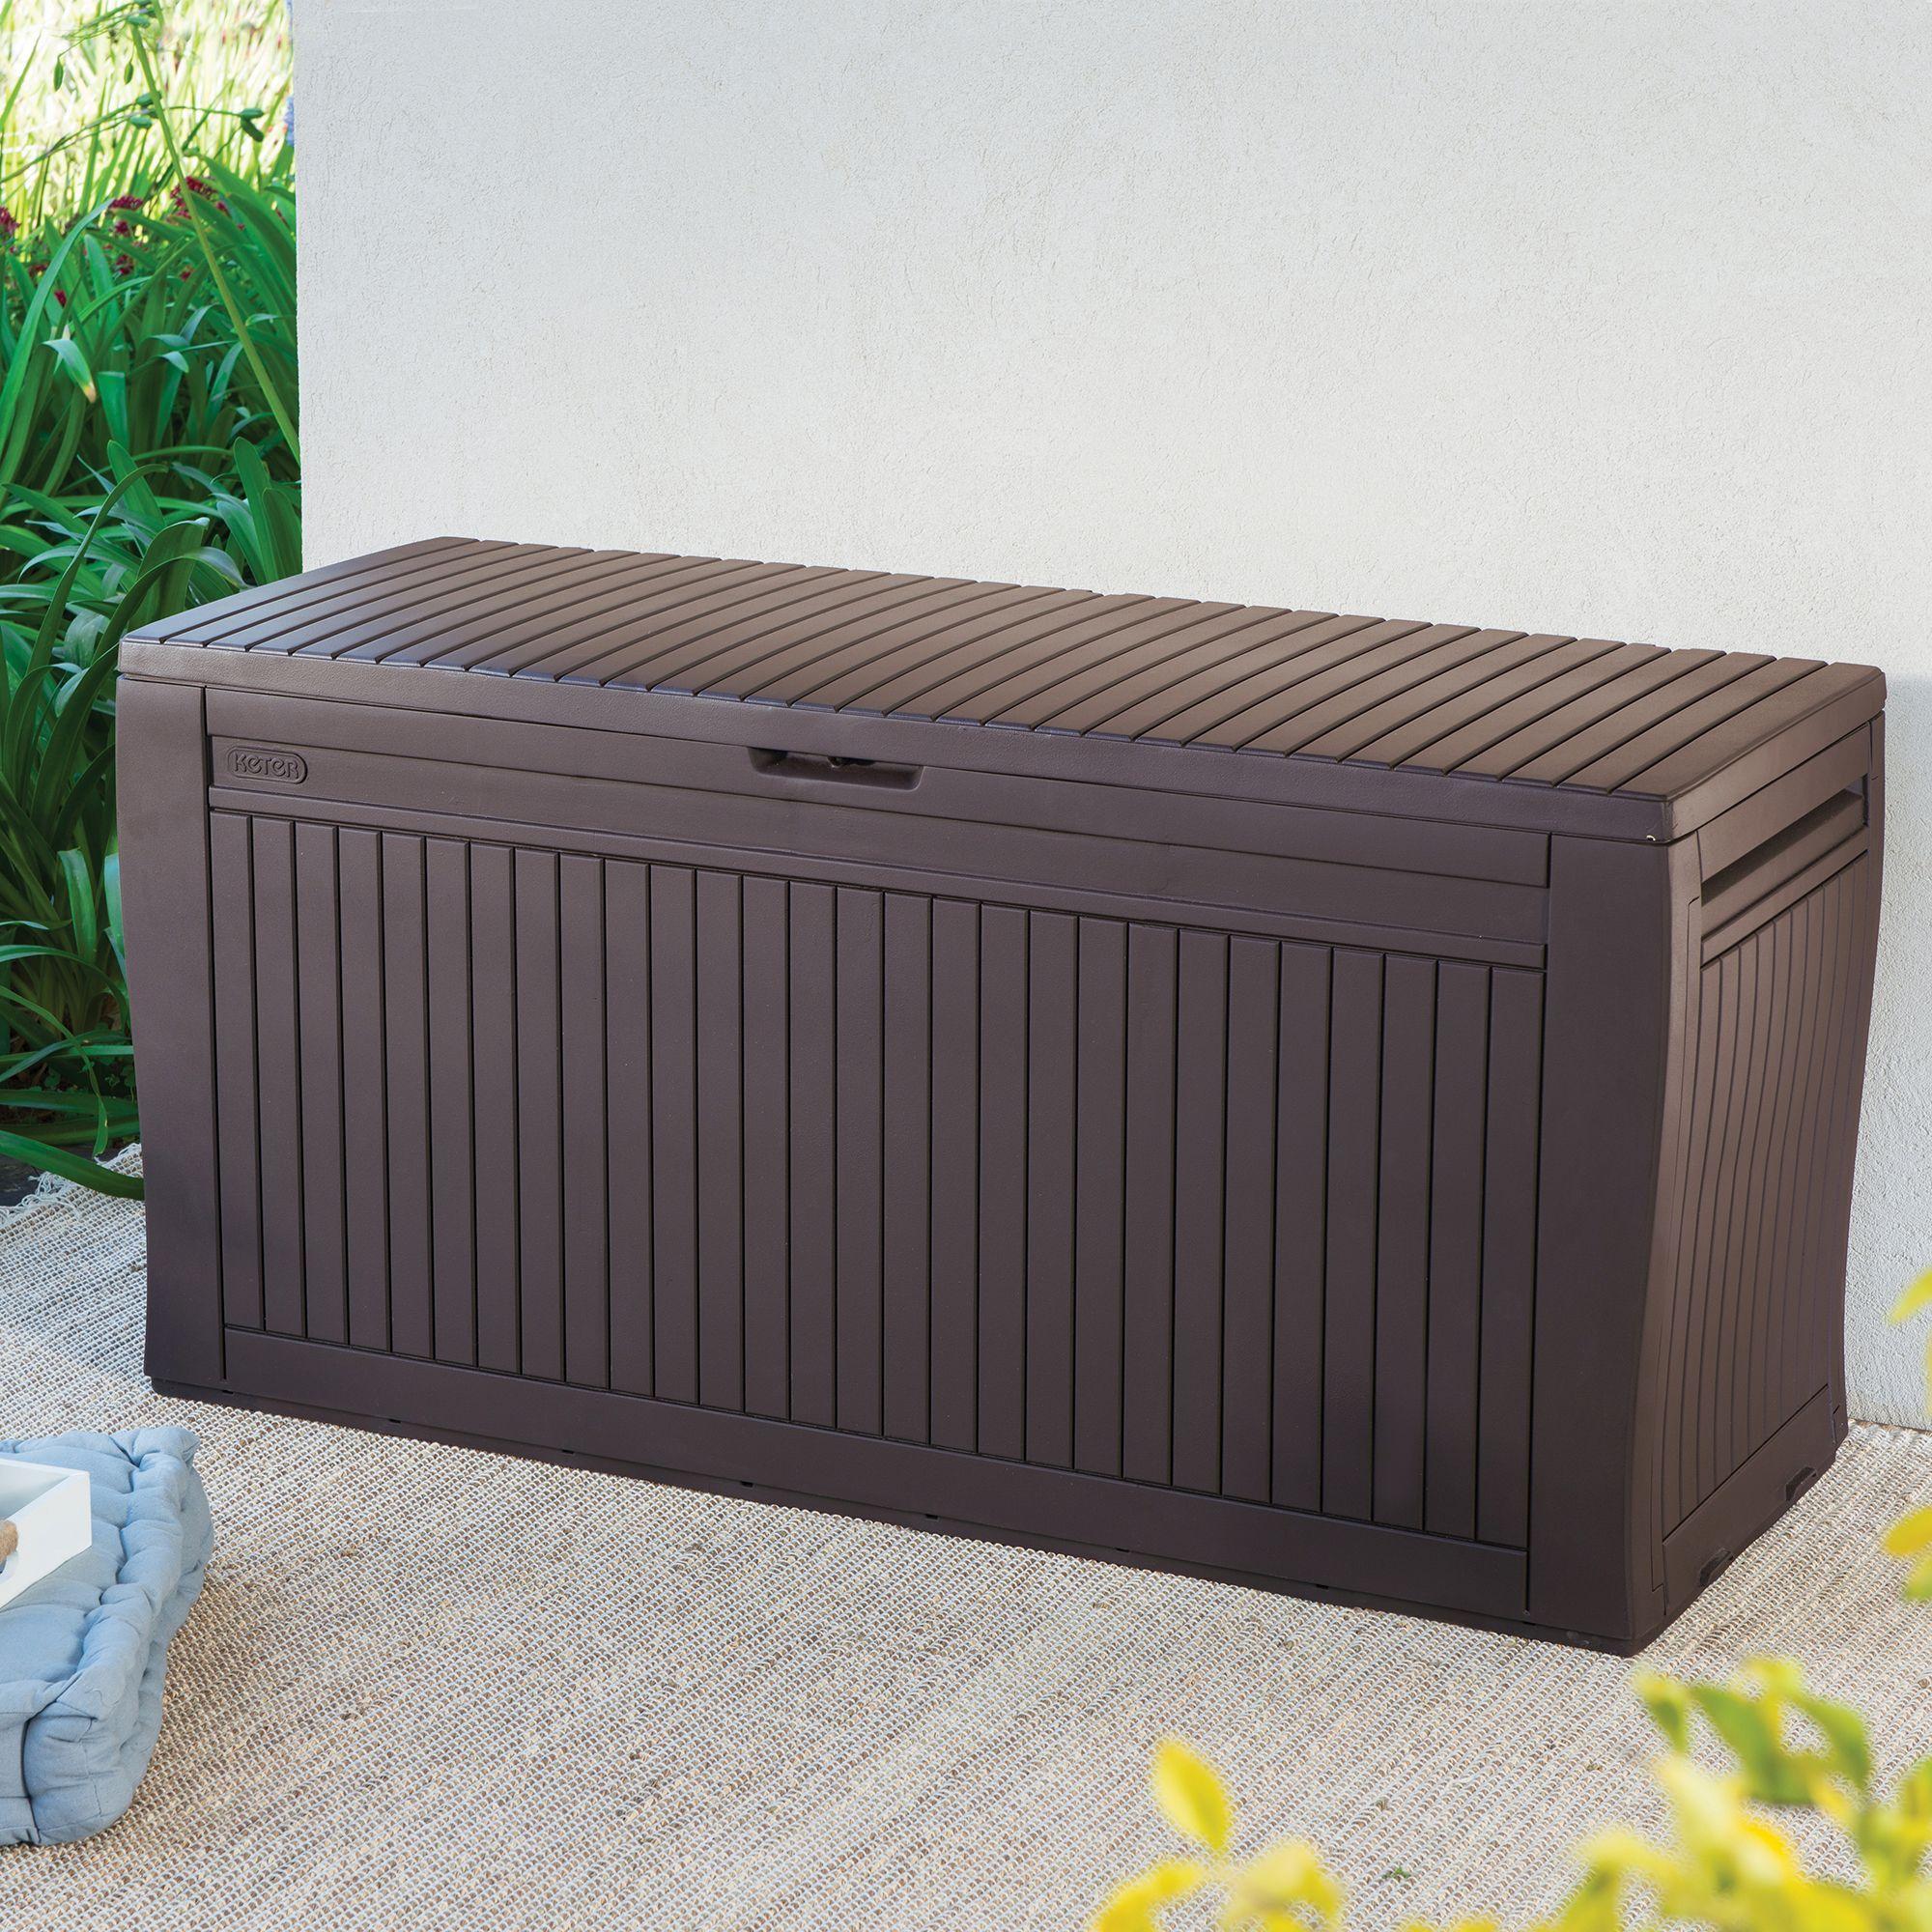 Comfy Wood Effect Plastic Patio Storage Box Departments